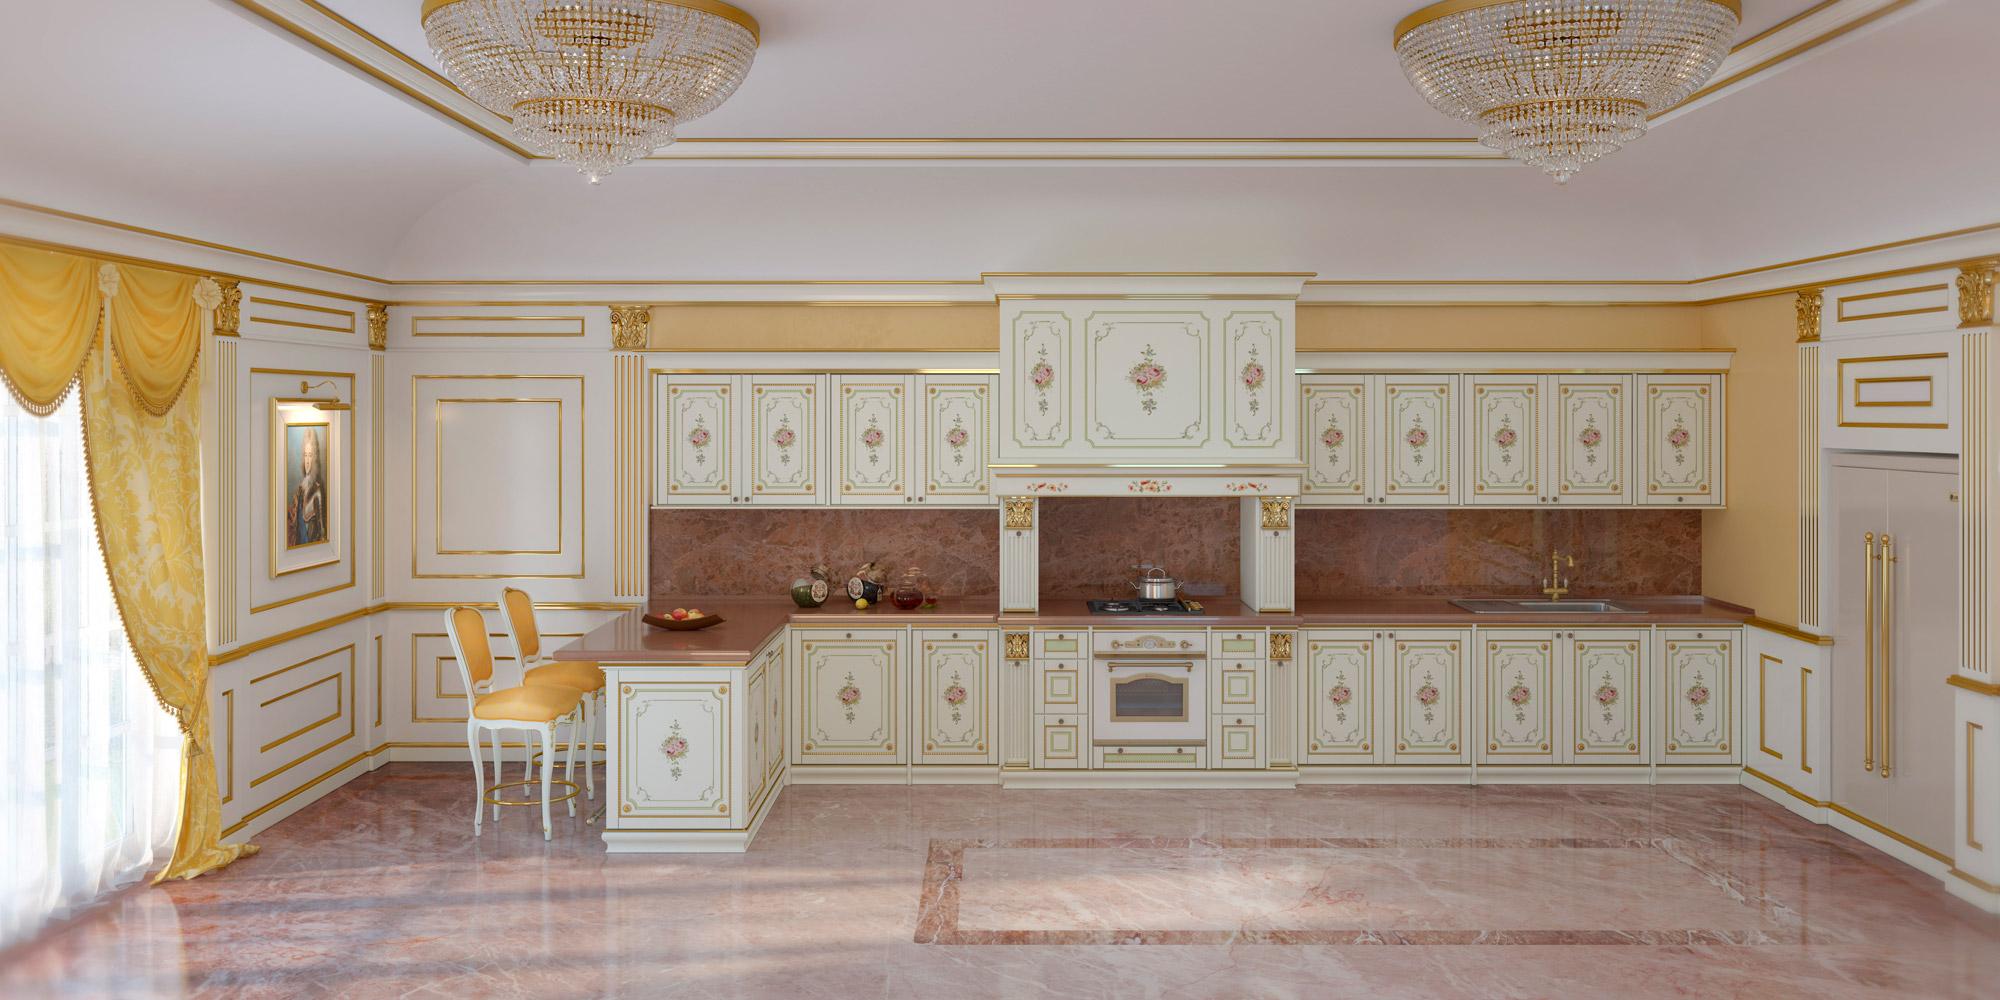 Stunning Tende Classiche Per Cucina Gallery - Home Interior Ideas ...